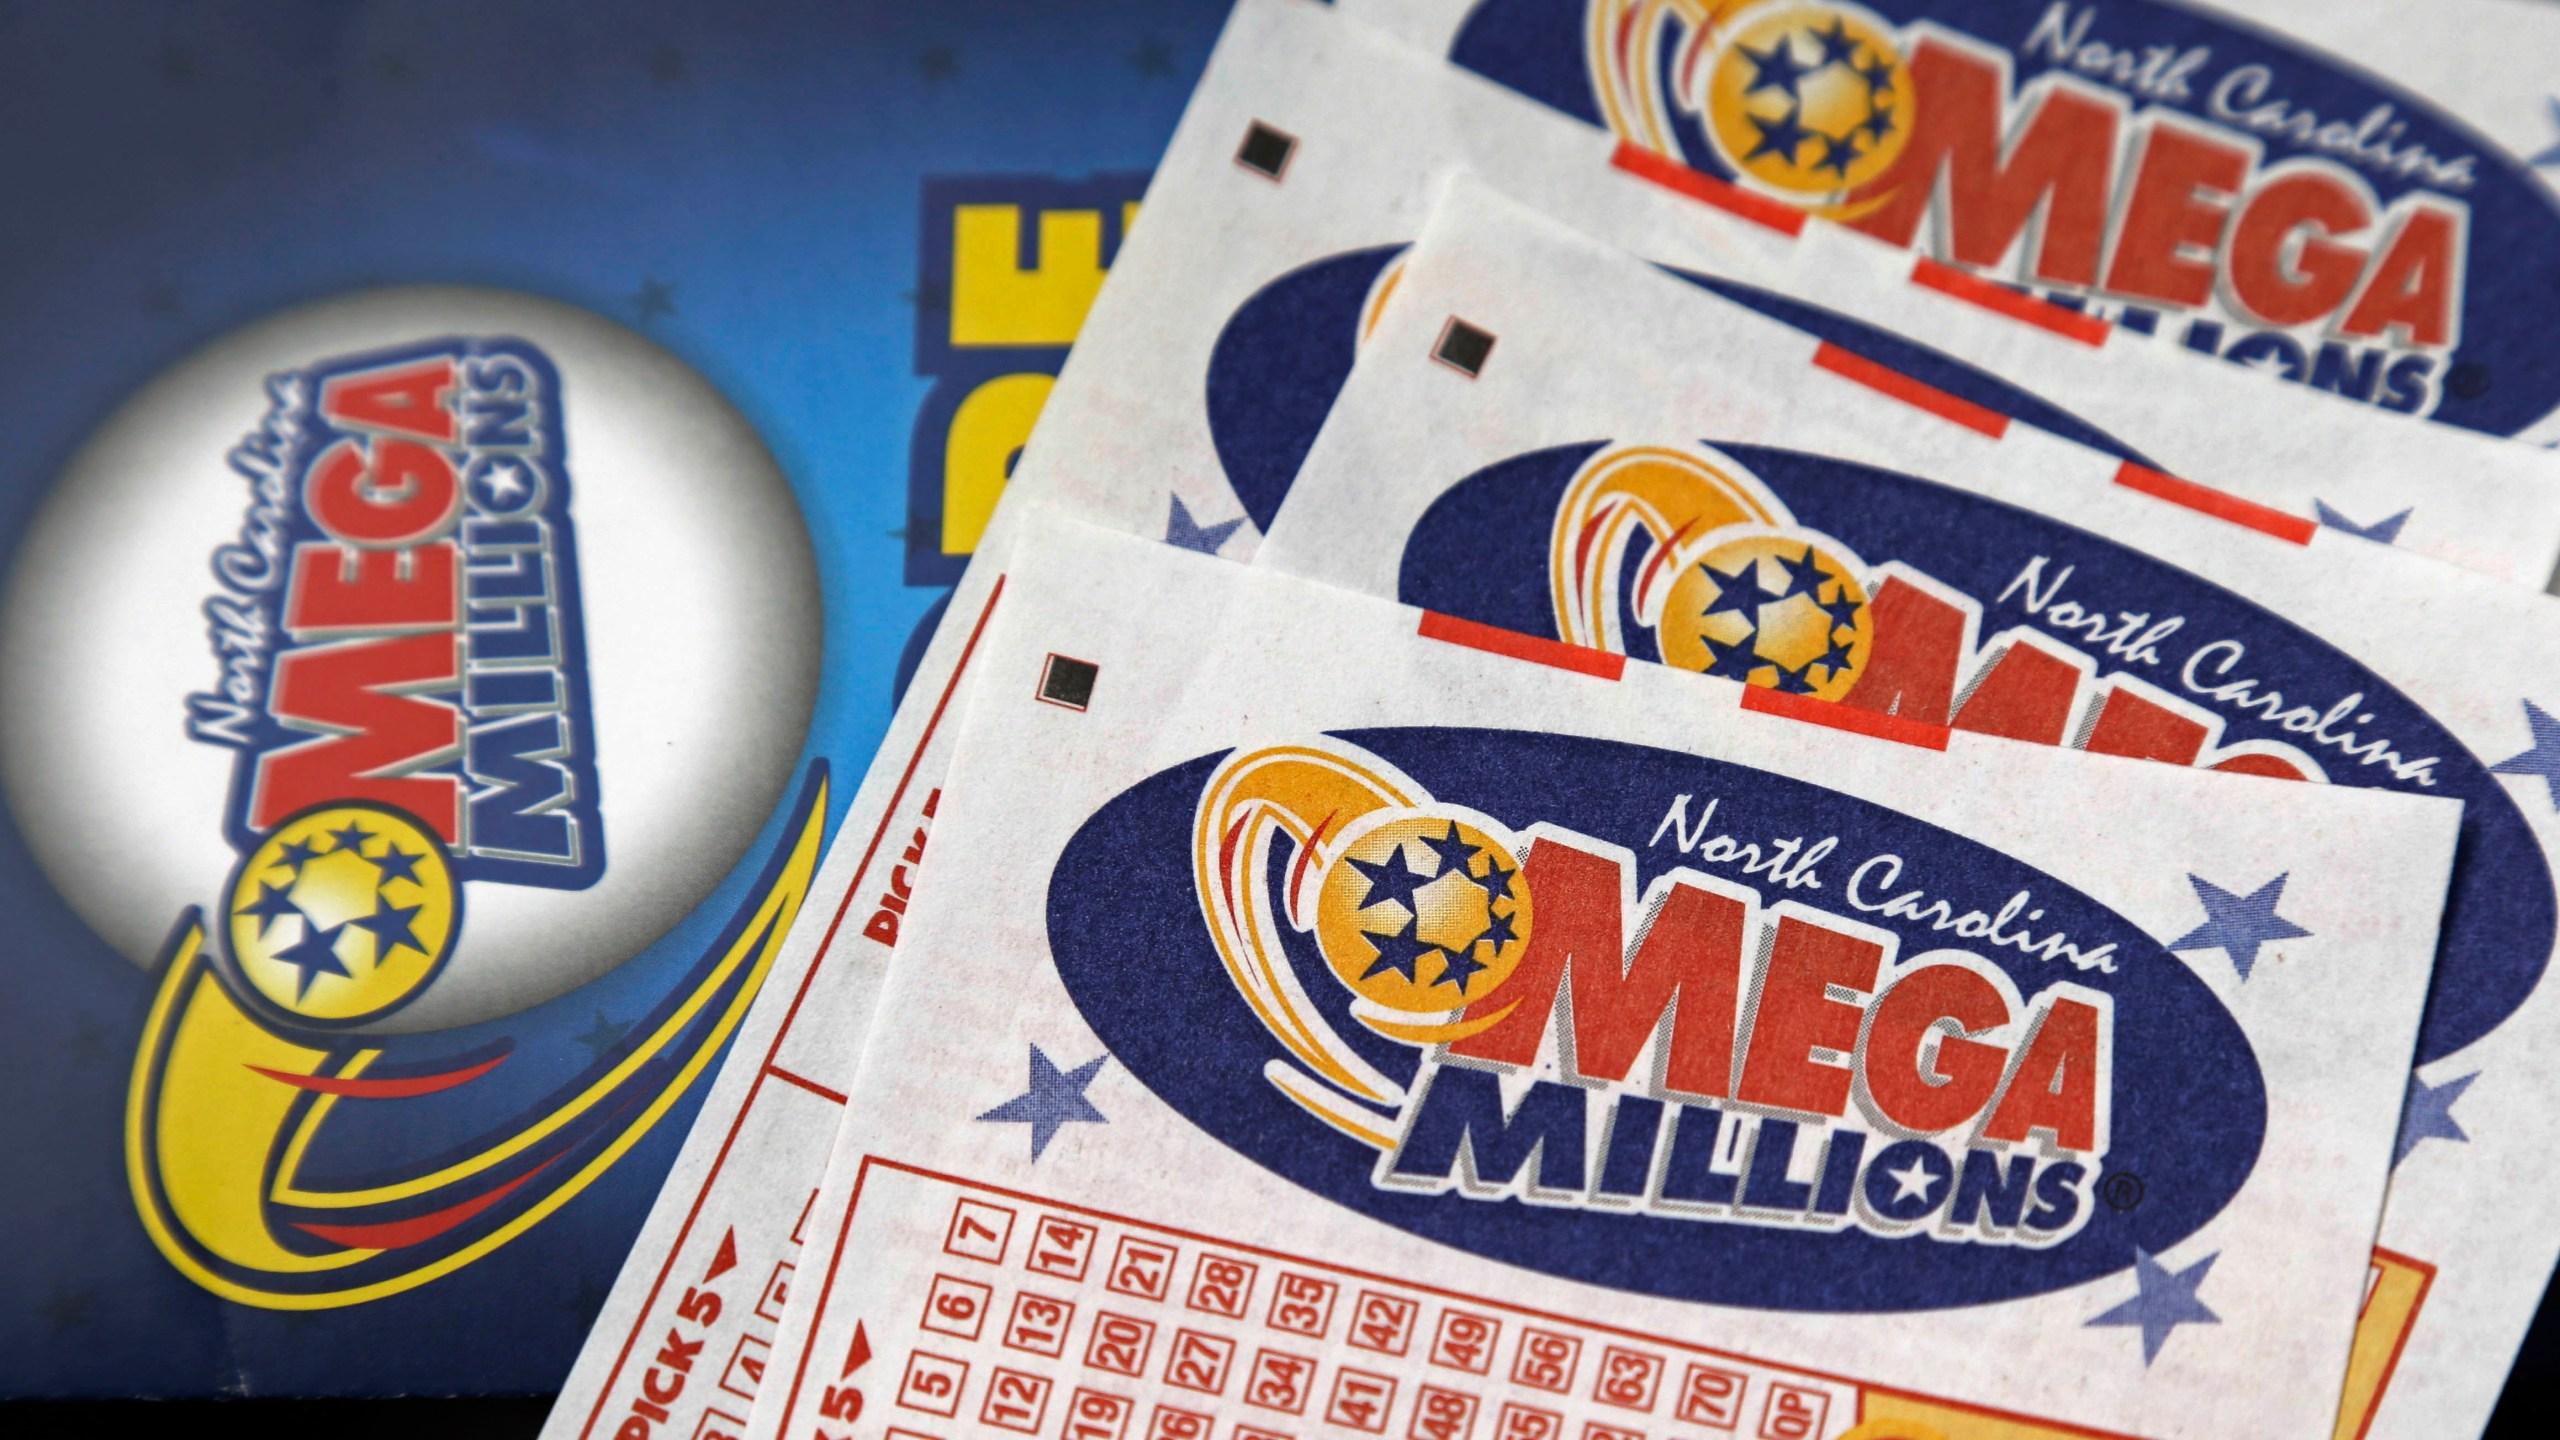 Lottery_Jackpot_95776-159532.jpg36917044